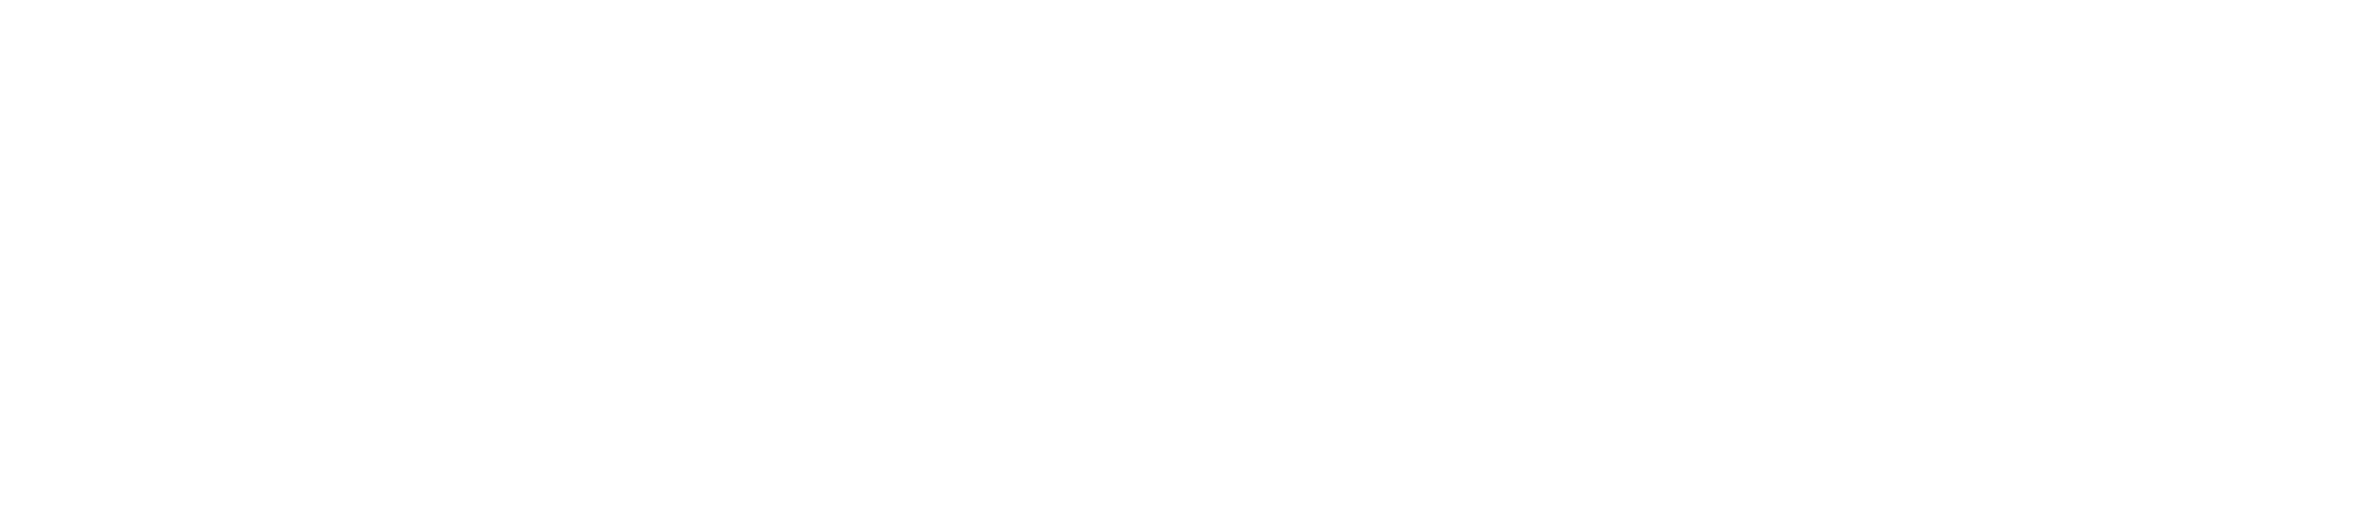 Raindance logo